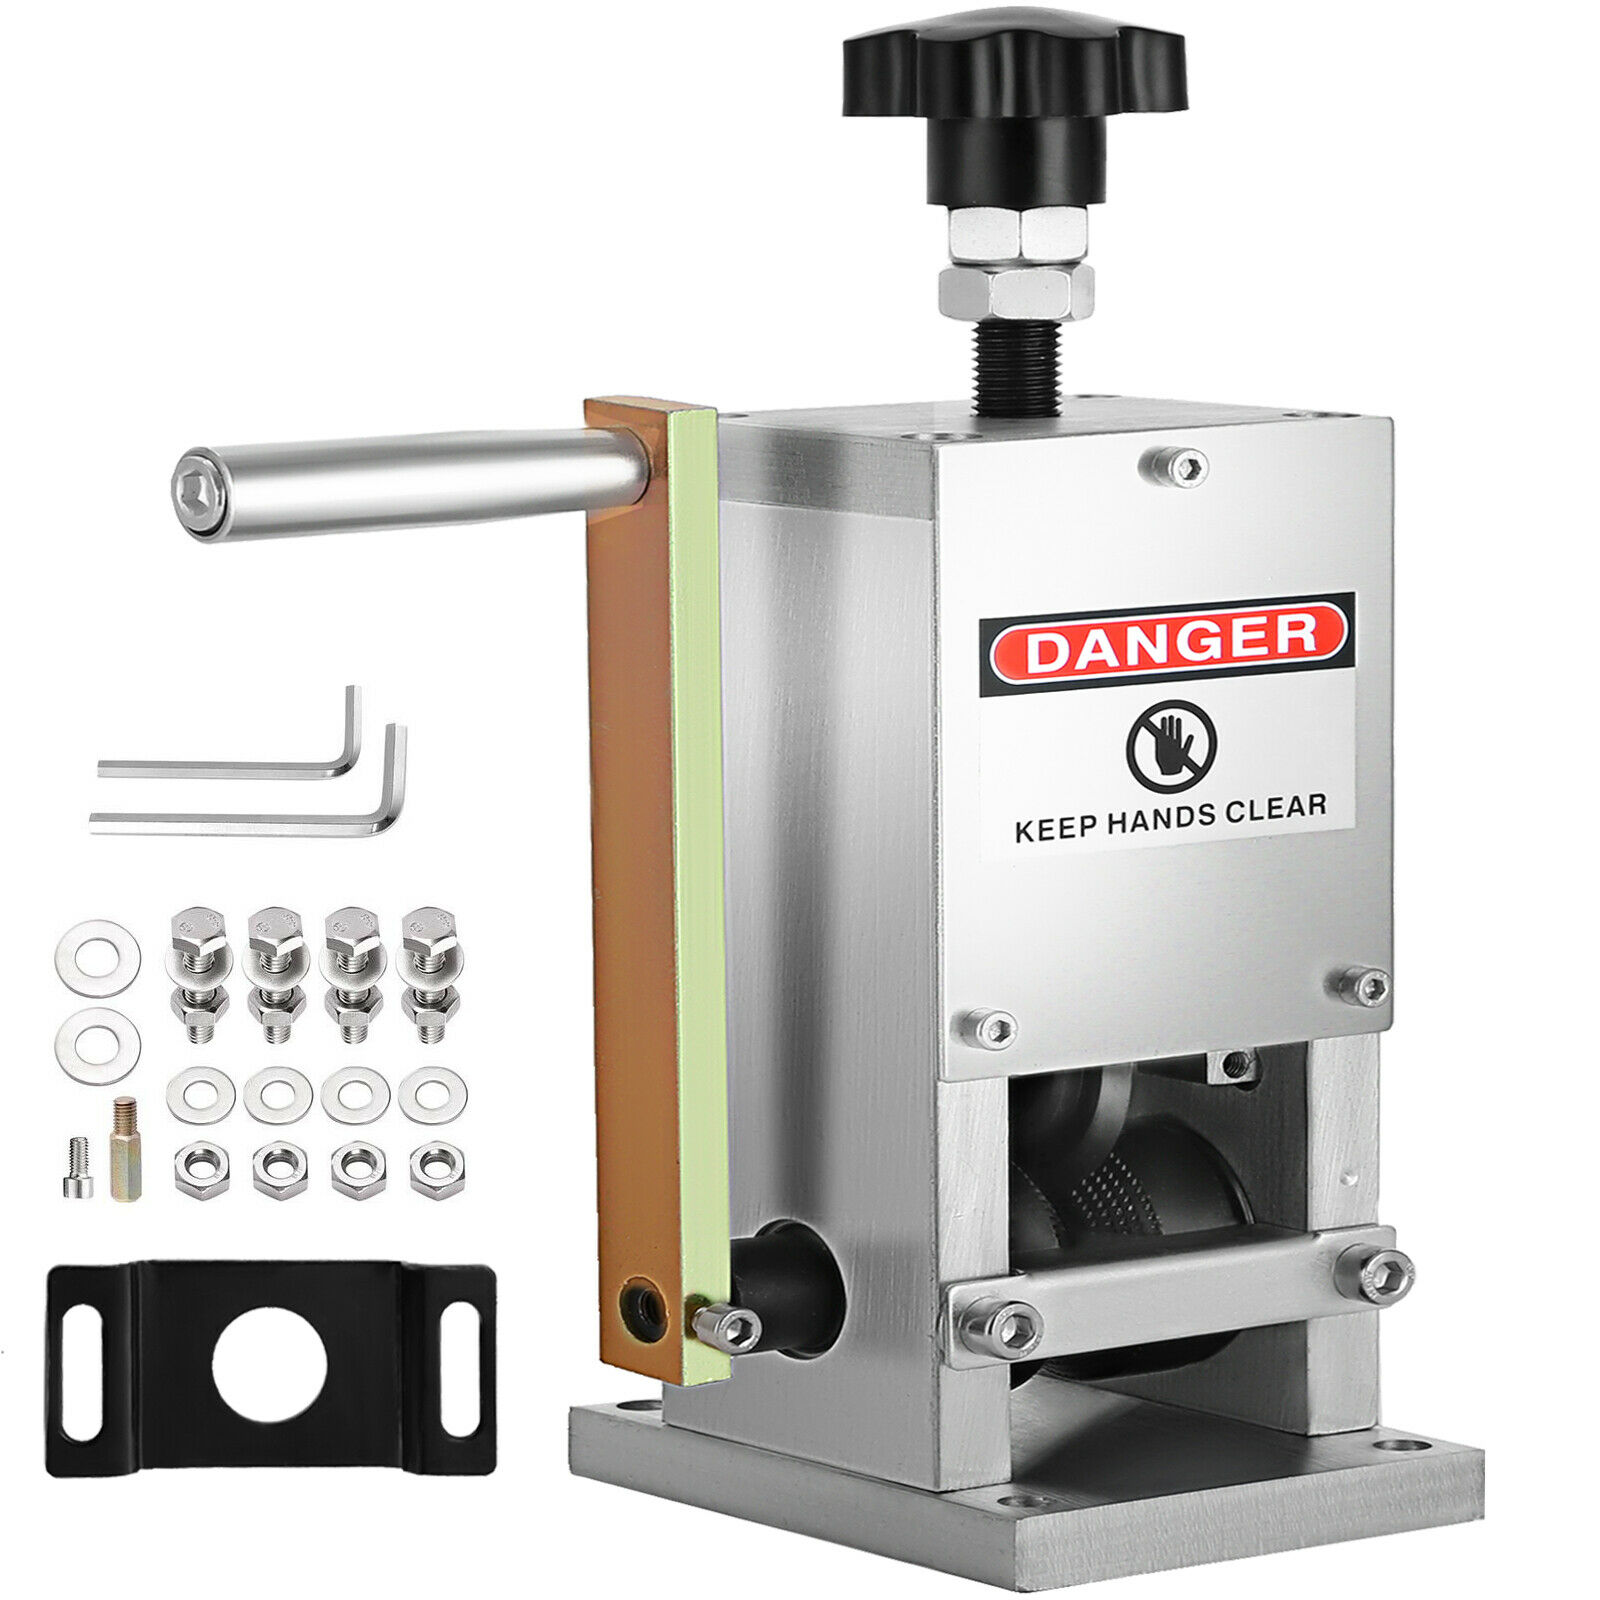 ManualWire تجريد آلة كرنك اليد ماكينة تجريد أسلاك مقشر كابل الخردة المعادن إعادة تدوير 1.5-25 مللي متر